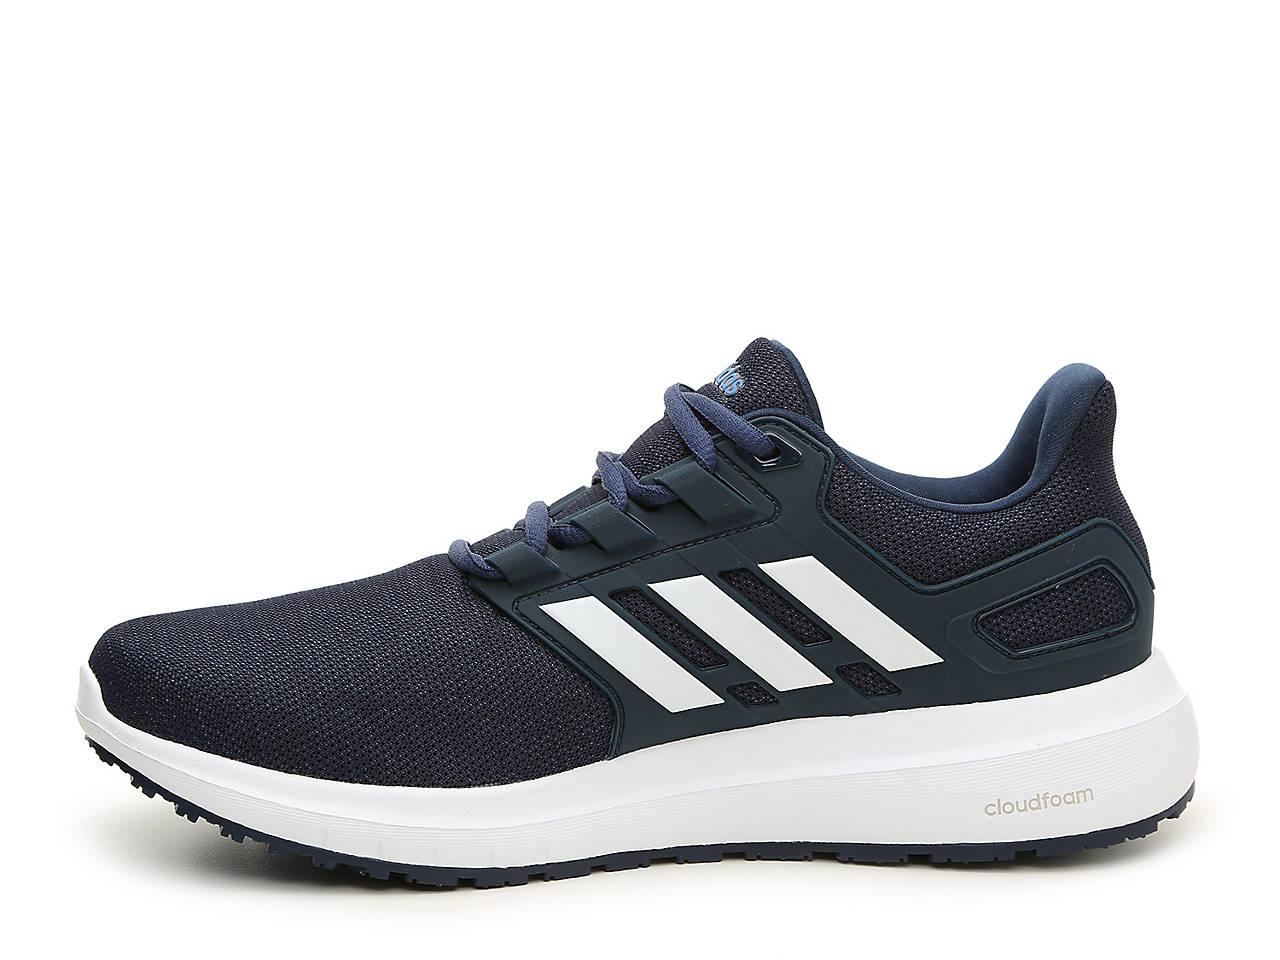 94e645f2 adidas Energy Cloud 2 Running Shoe - Men's Men's Shoes | DSW